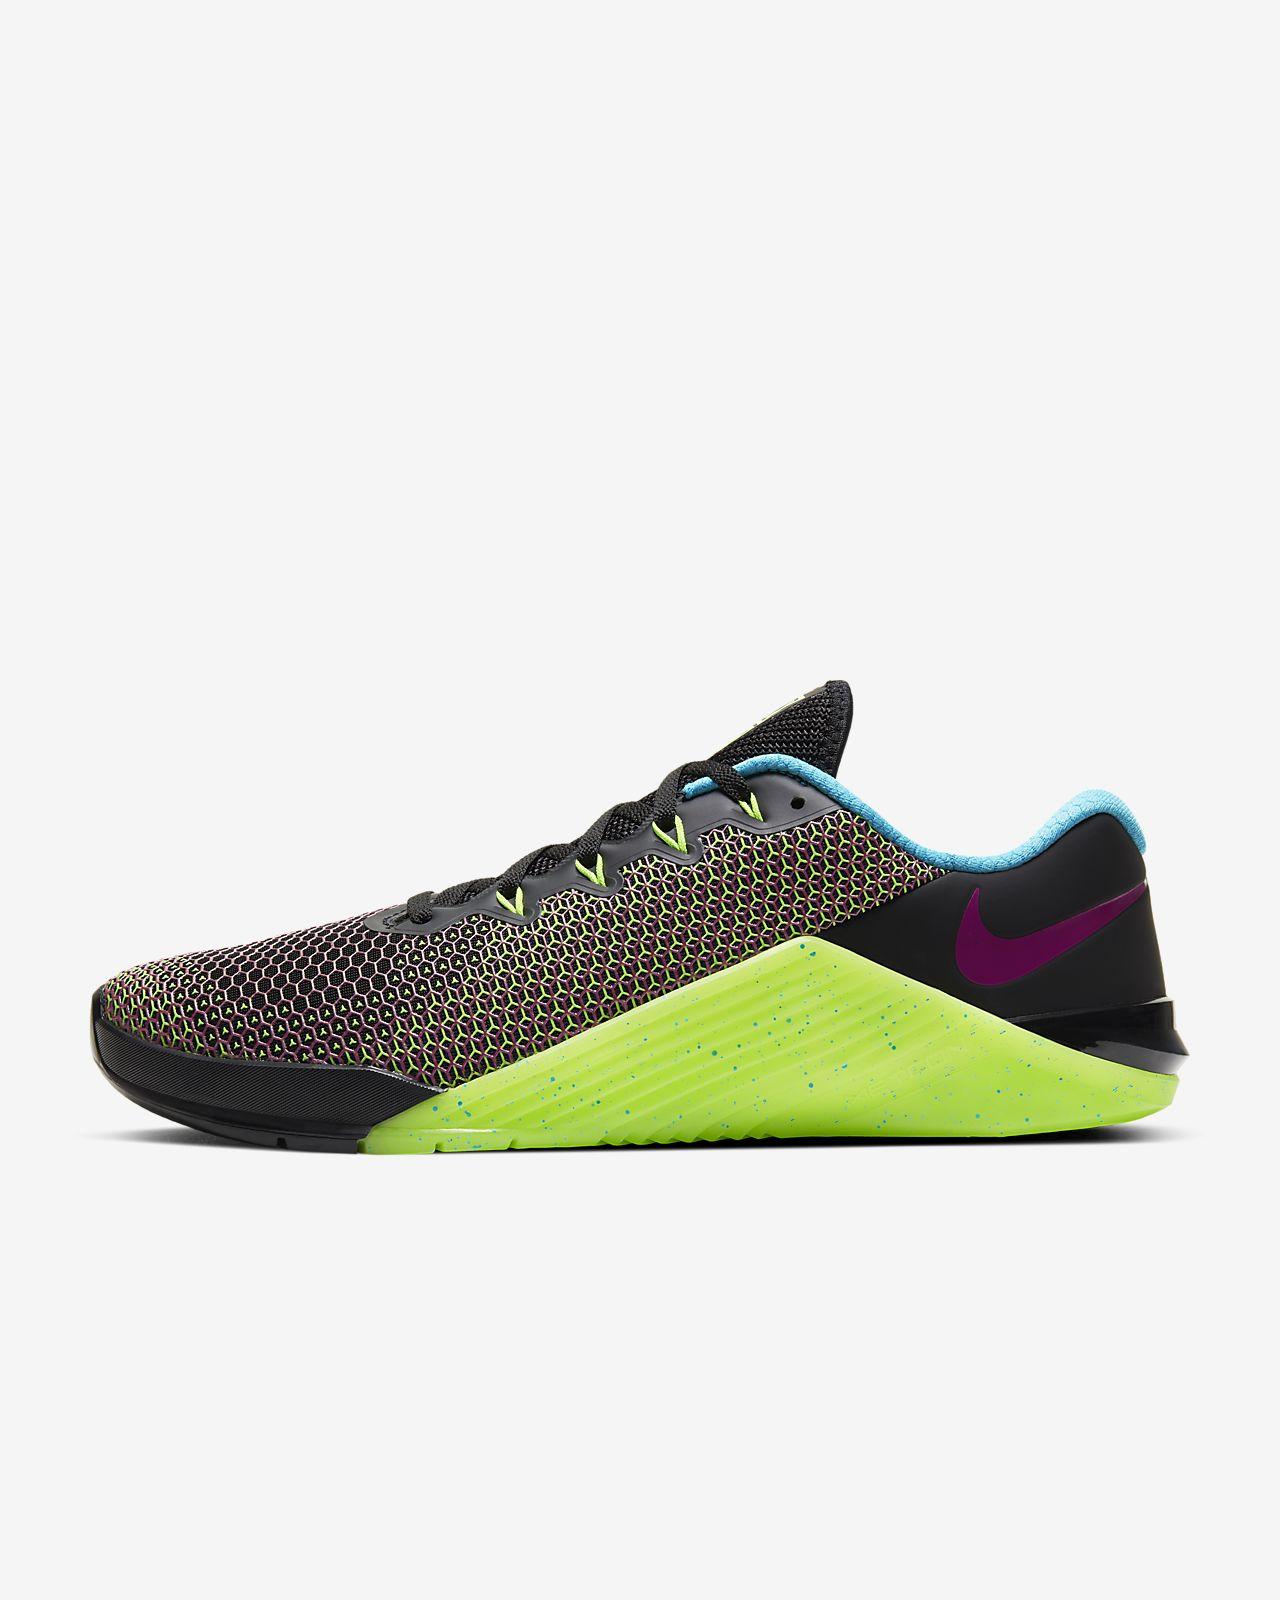 Nike Metcon 5 AMP Training Shoe